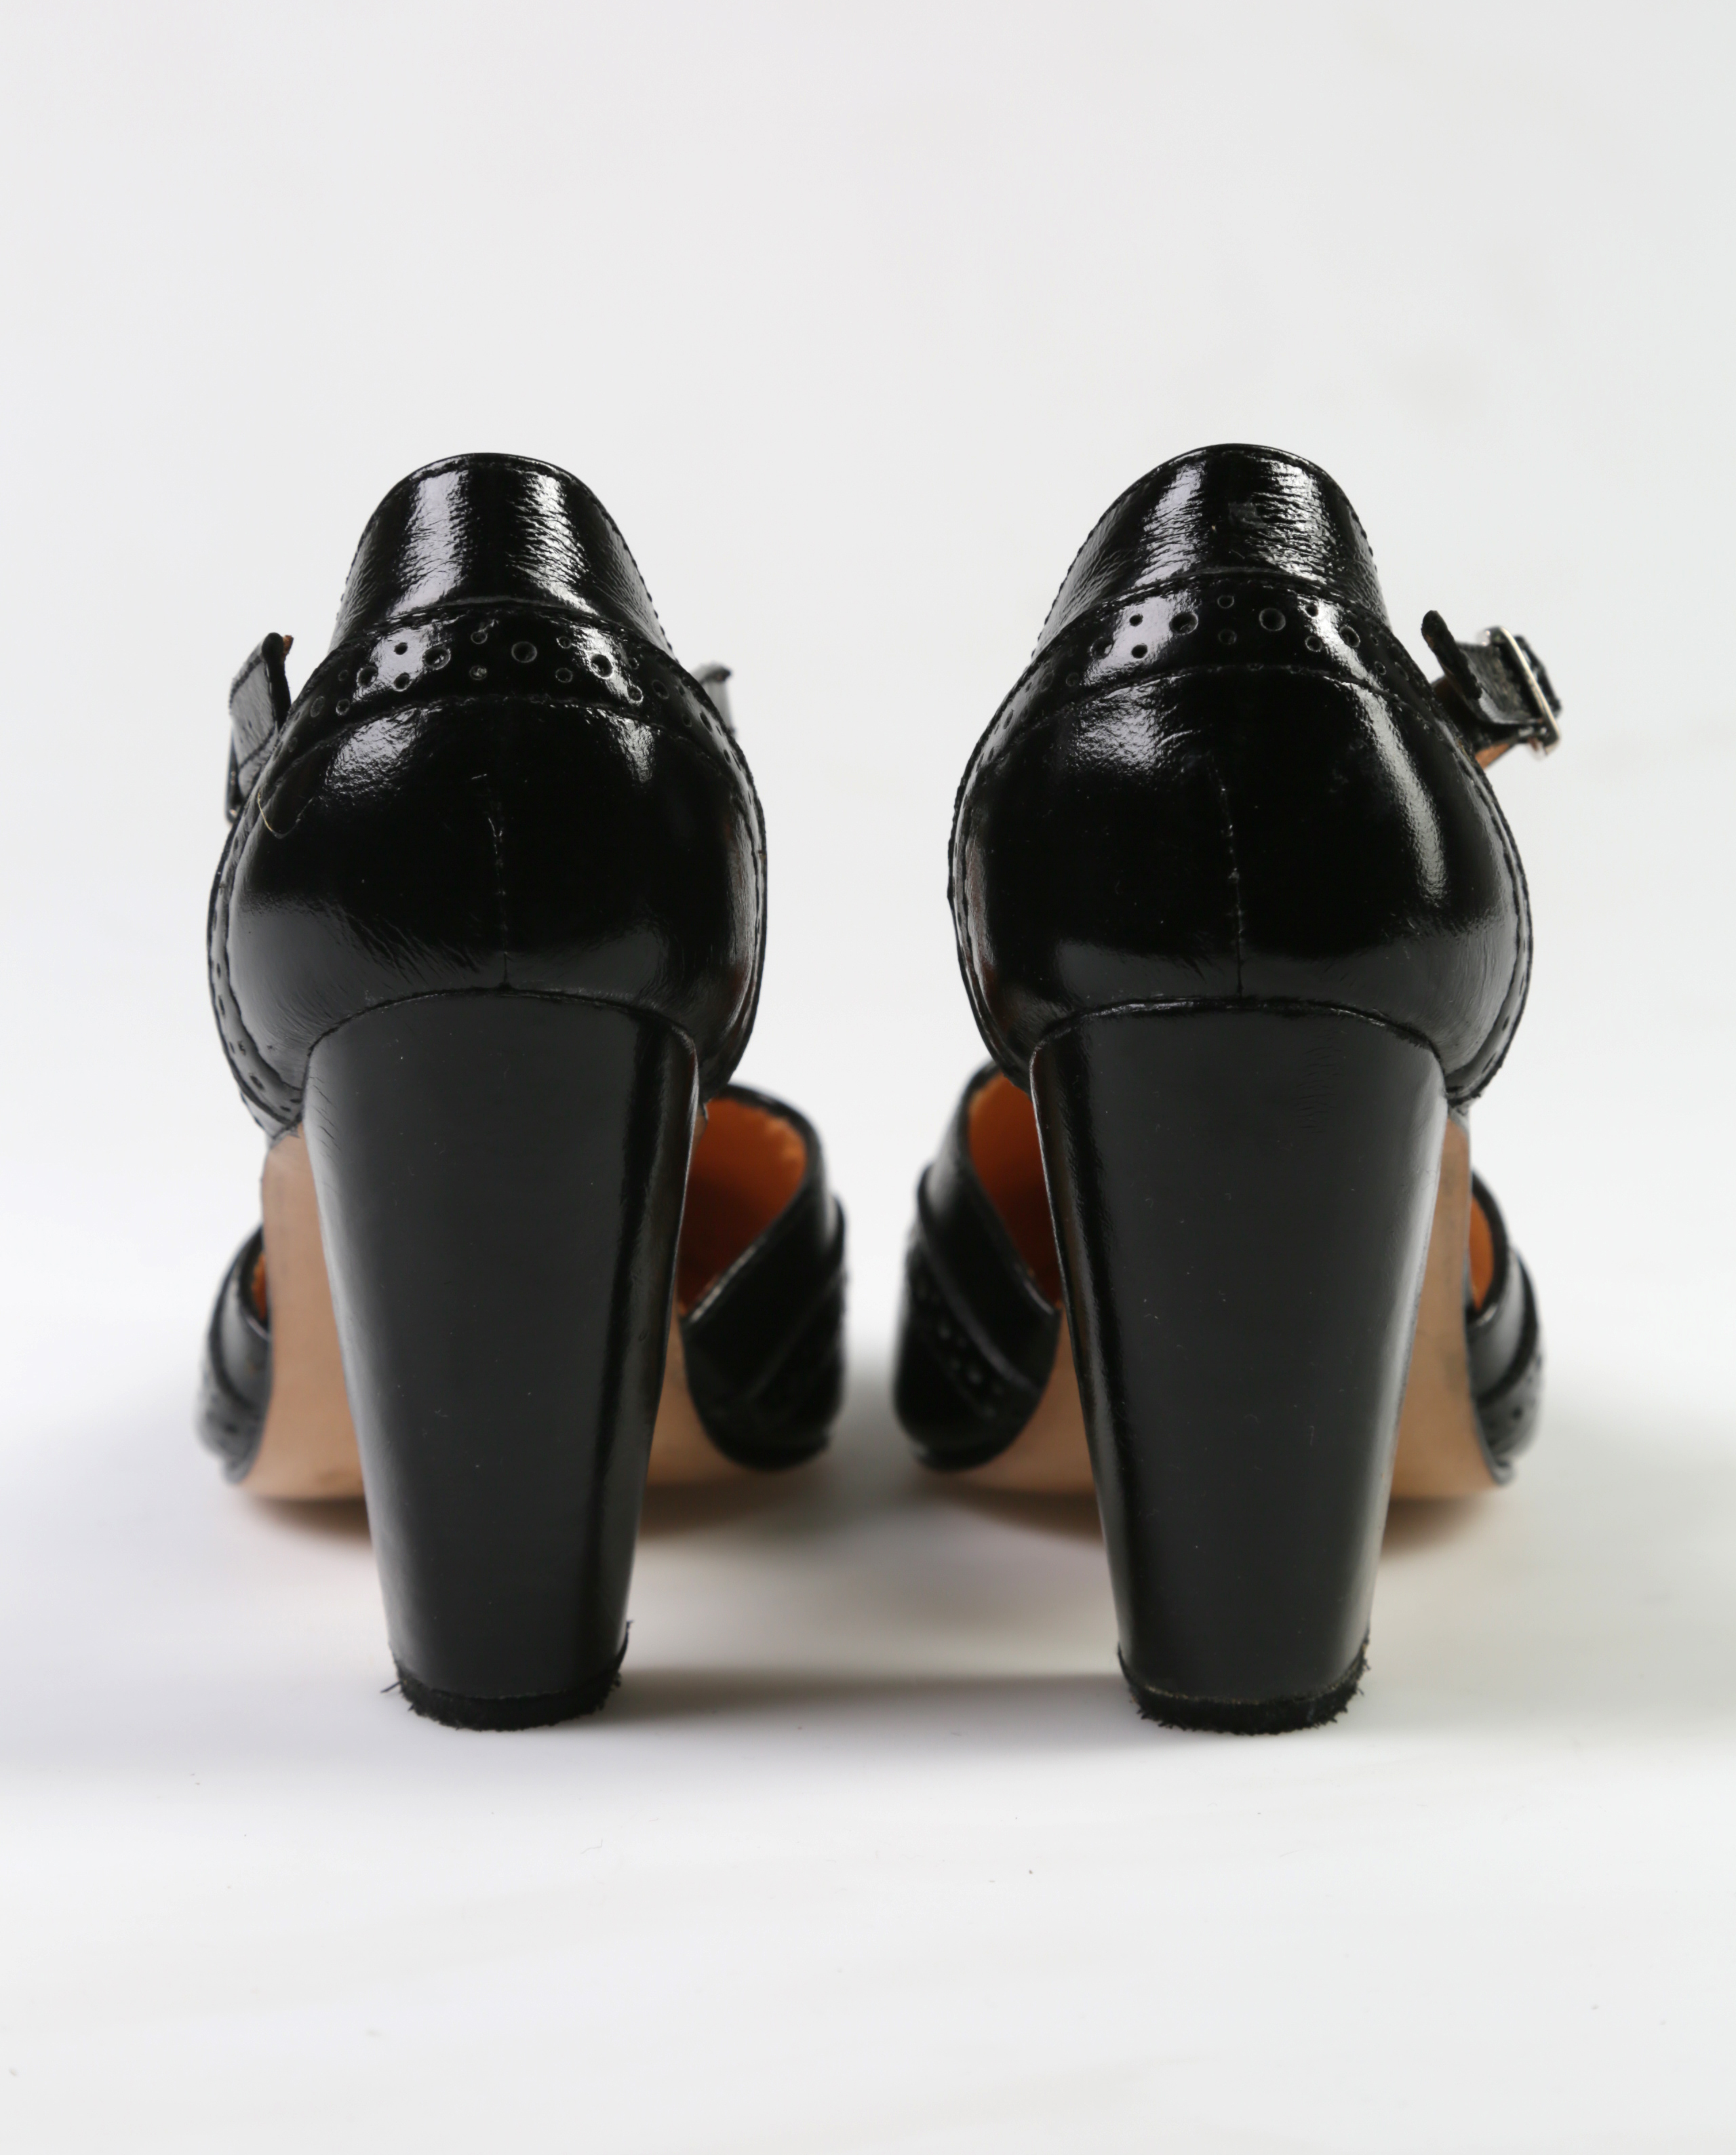 Dsctqrh Richato Negro Tango Ripley Zapato Vestir oWeCrBdx